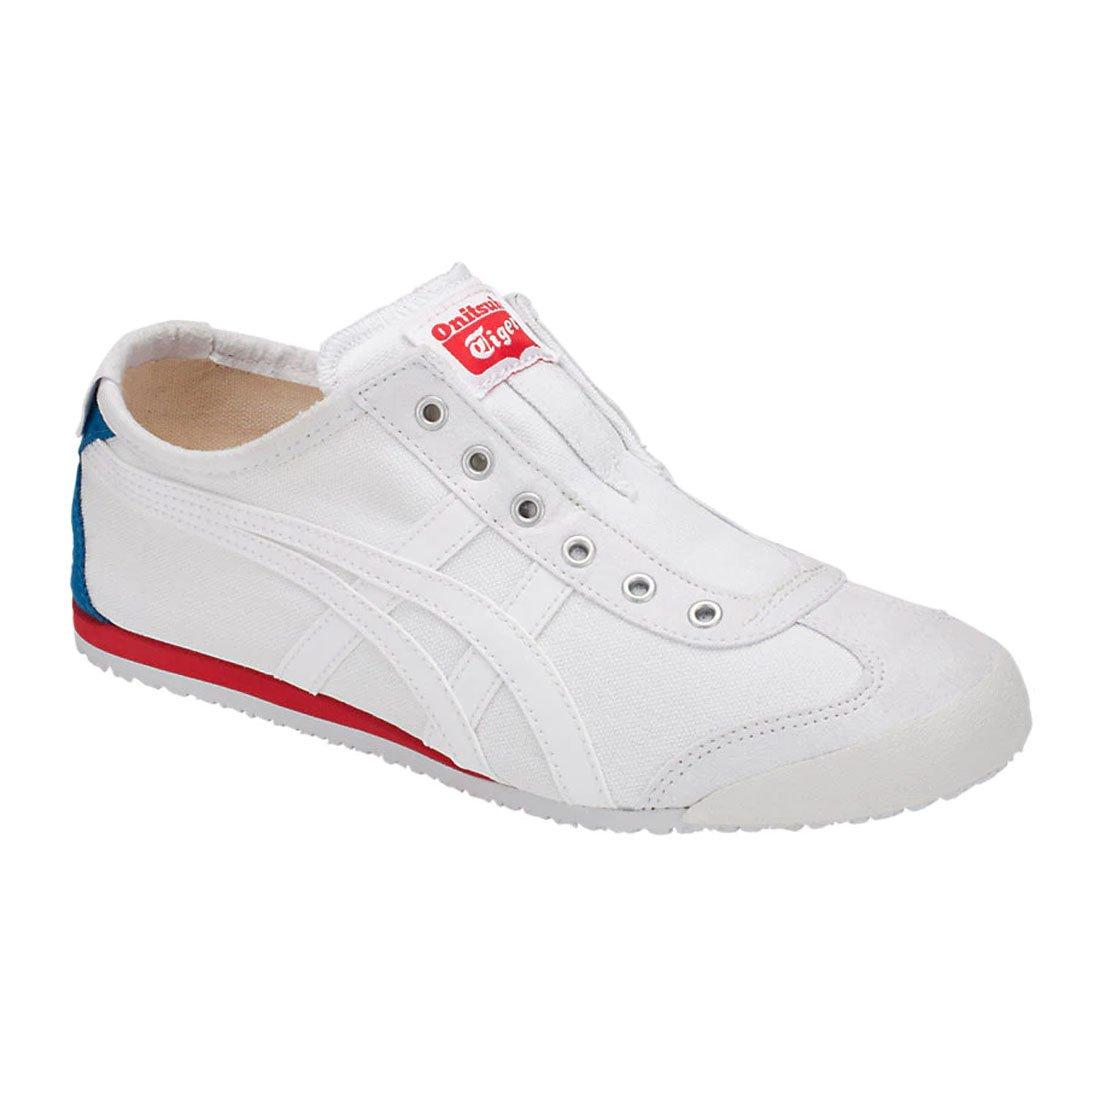 Onitsuka Tiger Mexico 66 Slip-On Classic Running Sneaker B07DRKQBGS 11 M US Women / 9.5 M US Men|White/White 2